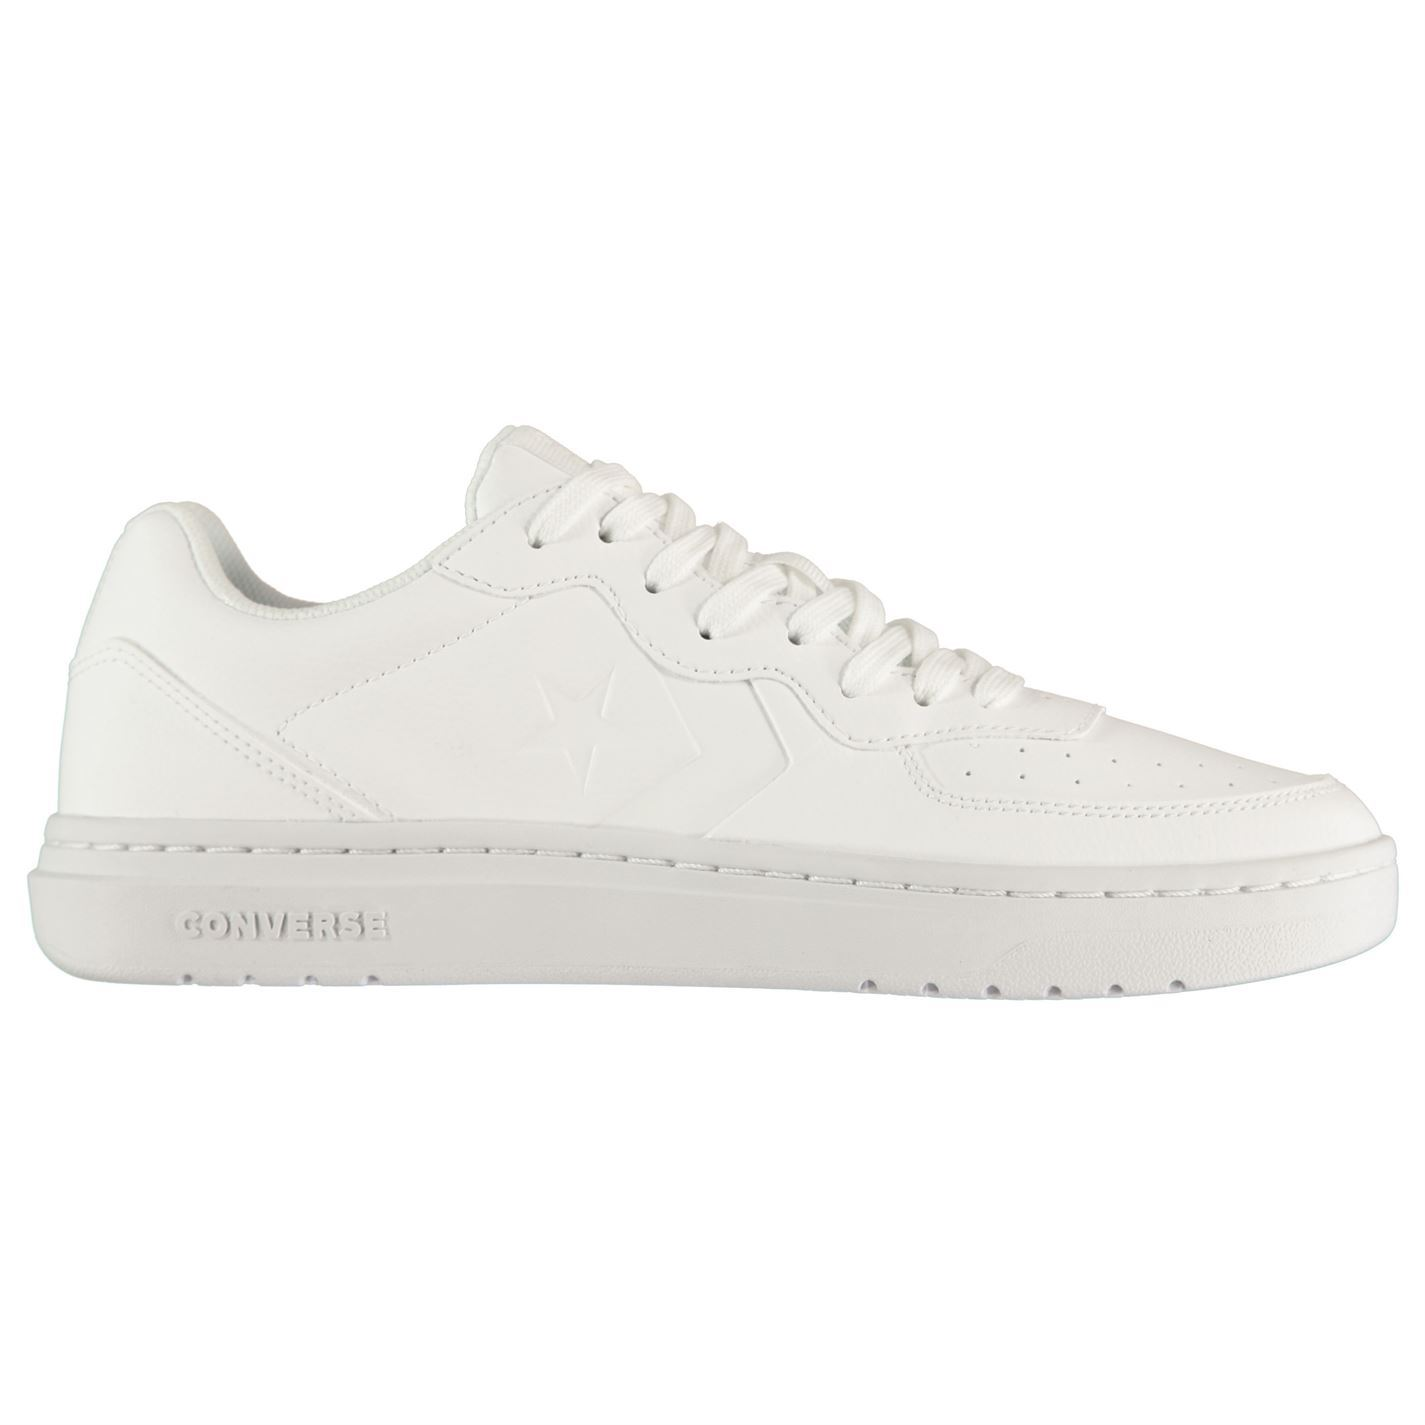 Converse-Ox-Rival-Cuir-Baskets-Pour-Homme-Chaussures-De-Loisirs-Chaussures-Baskets miniature 12